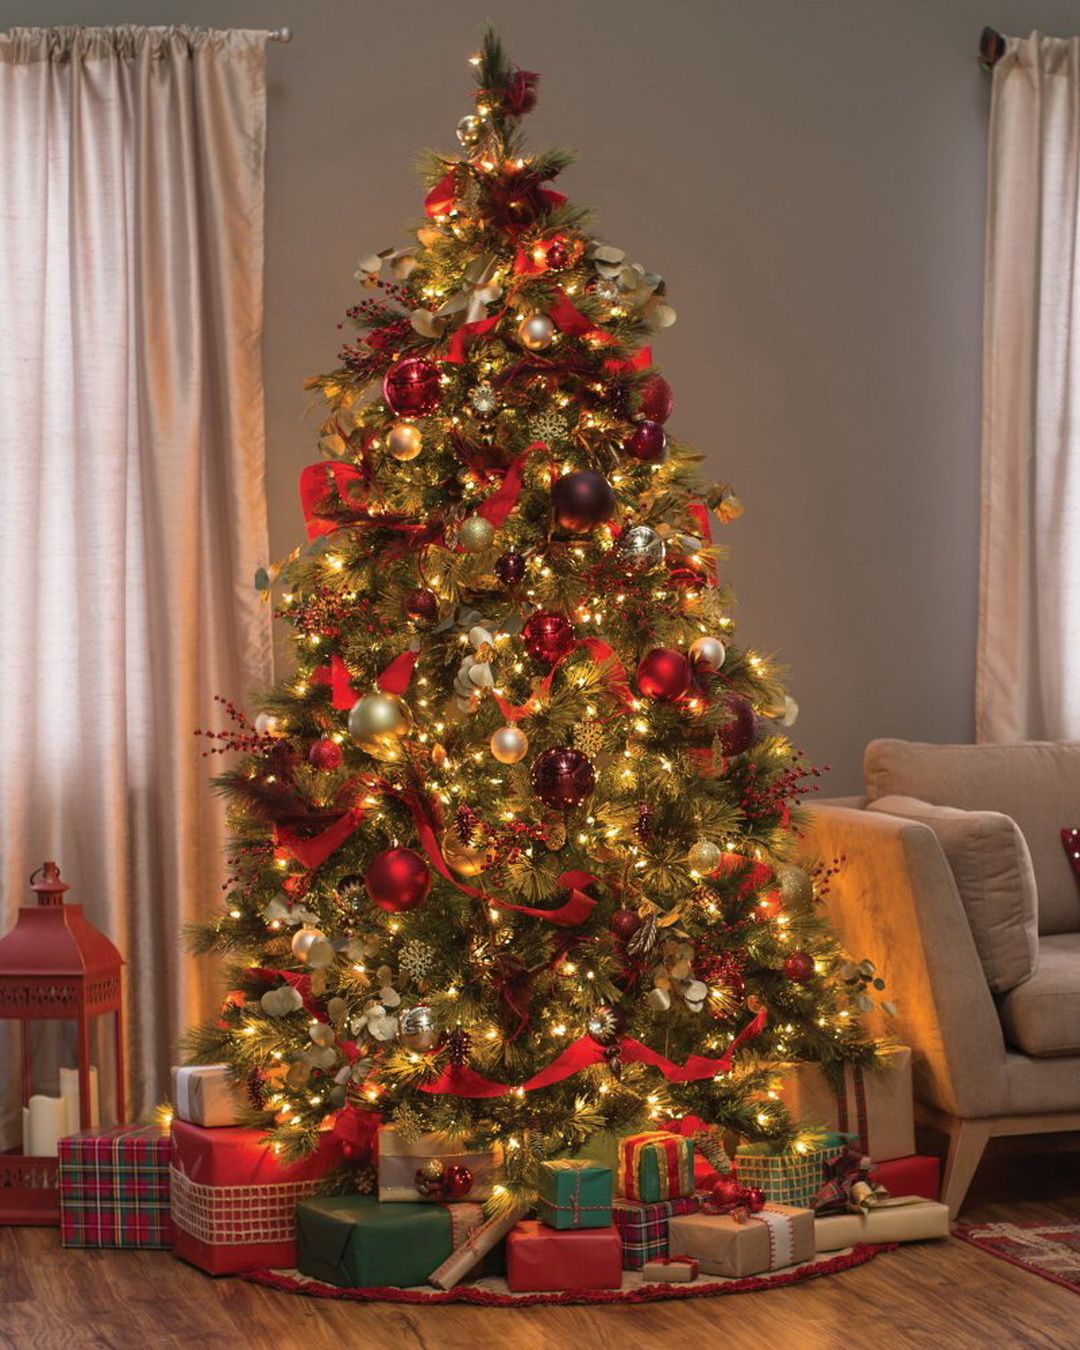 Carolina Pine Full Pre Lit Christmas Tree By National Tree Company Real Christmas Tree Pre Lit Christmas Tree Fake Christmas Trees